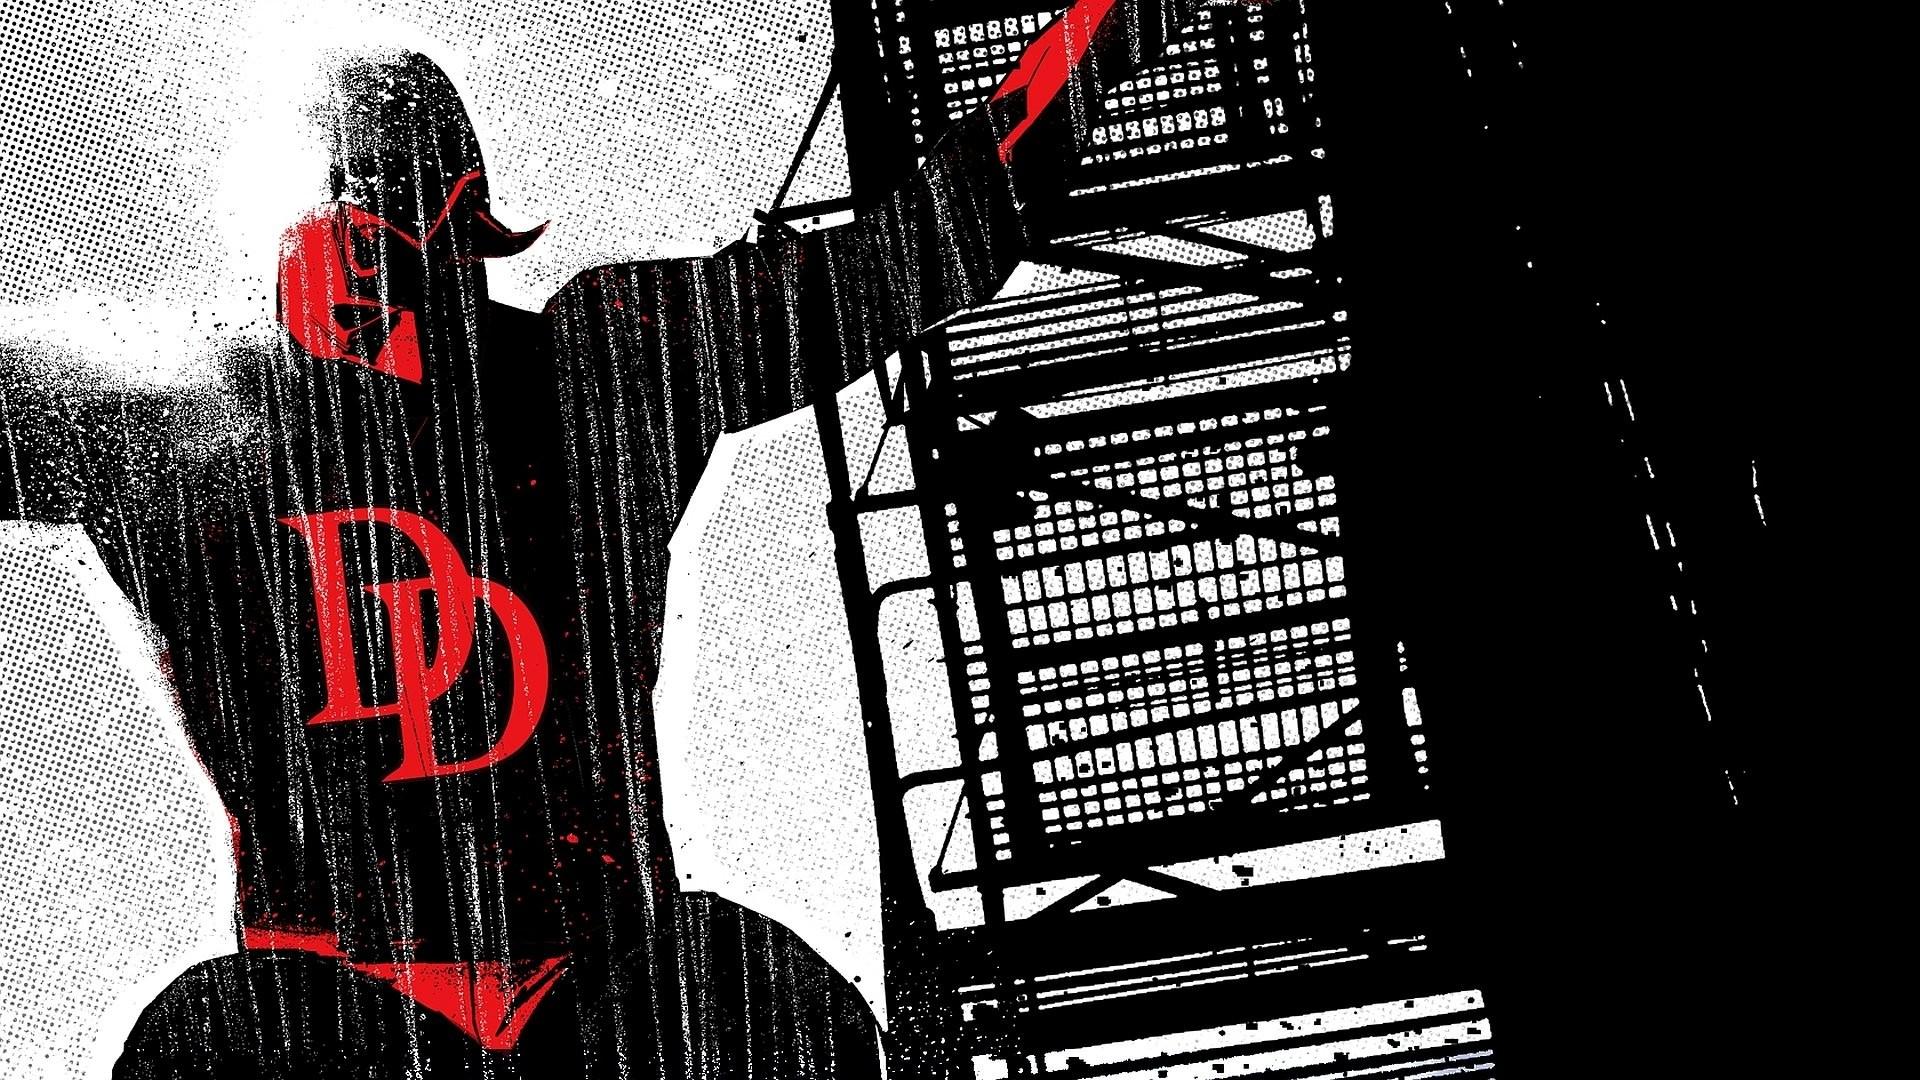 Res: 1920x1080, HD Wallpaper | Background Image ID:463127.  Comics Daredevil